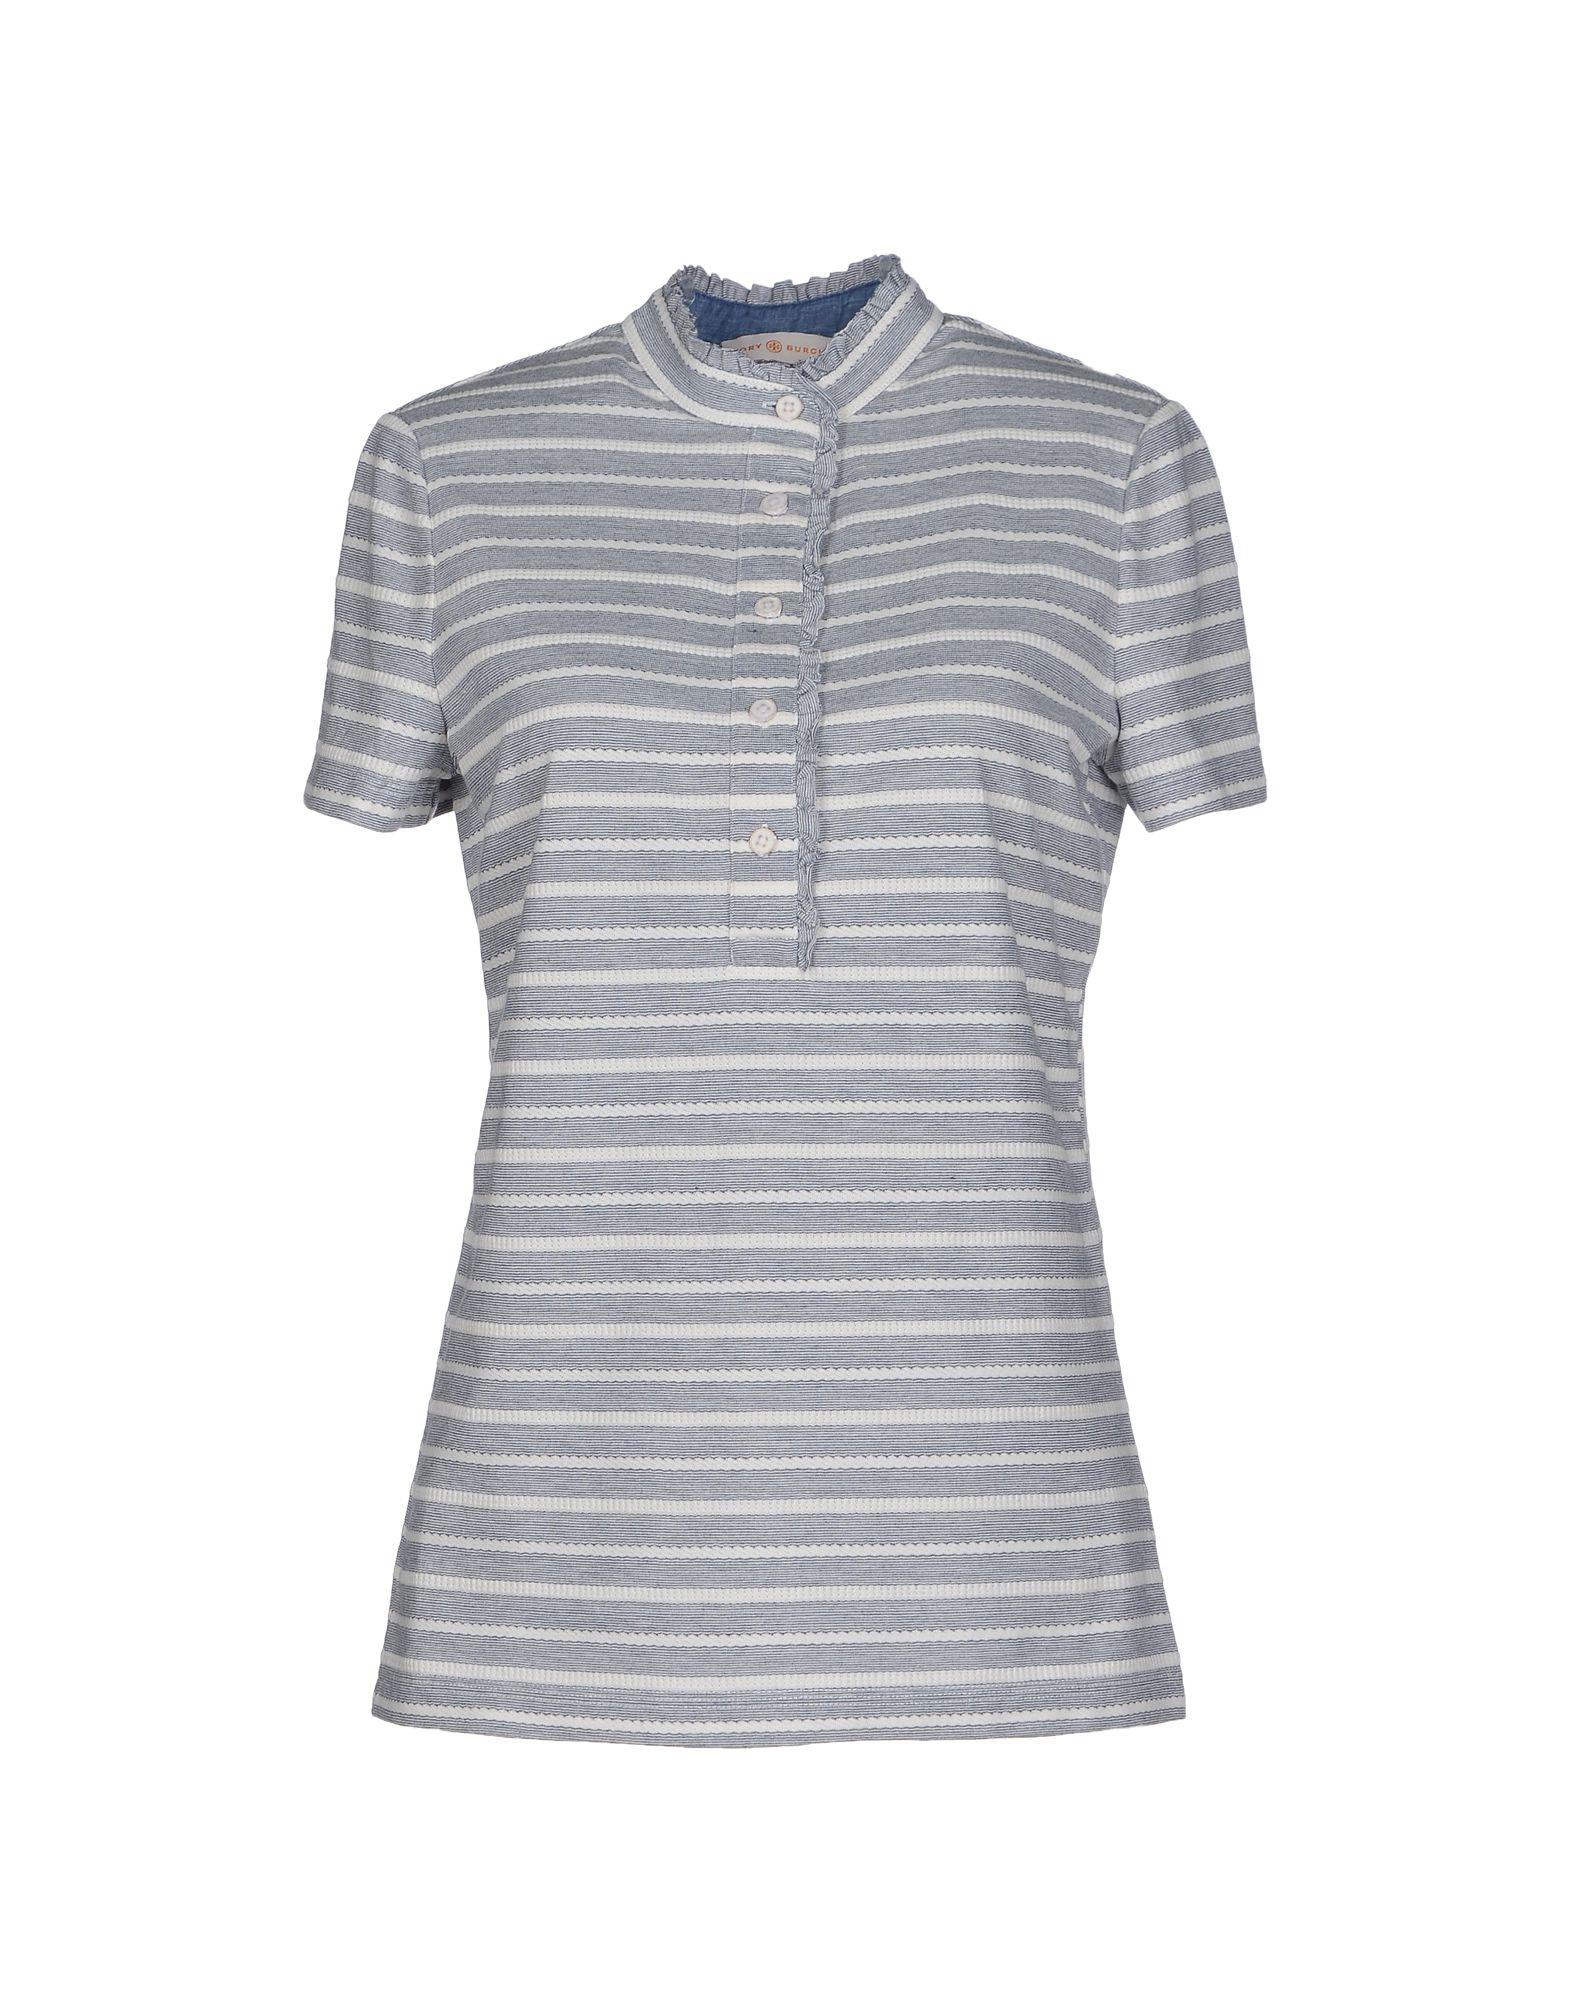 Lyst tory burch t shirt in gray for Tory burch t shirt